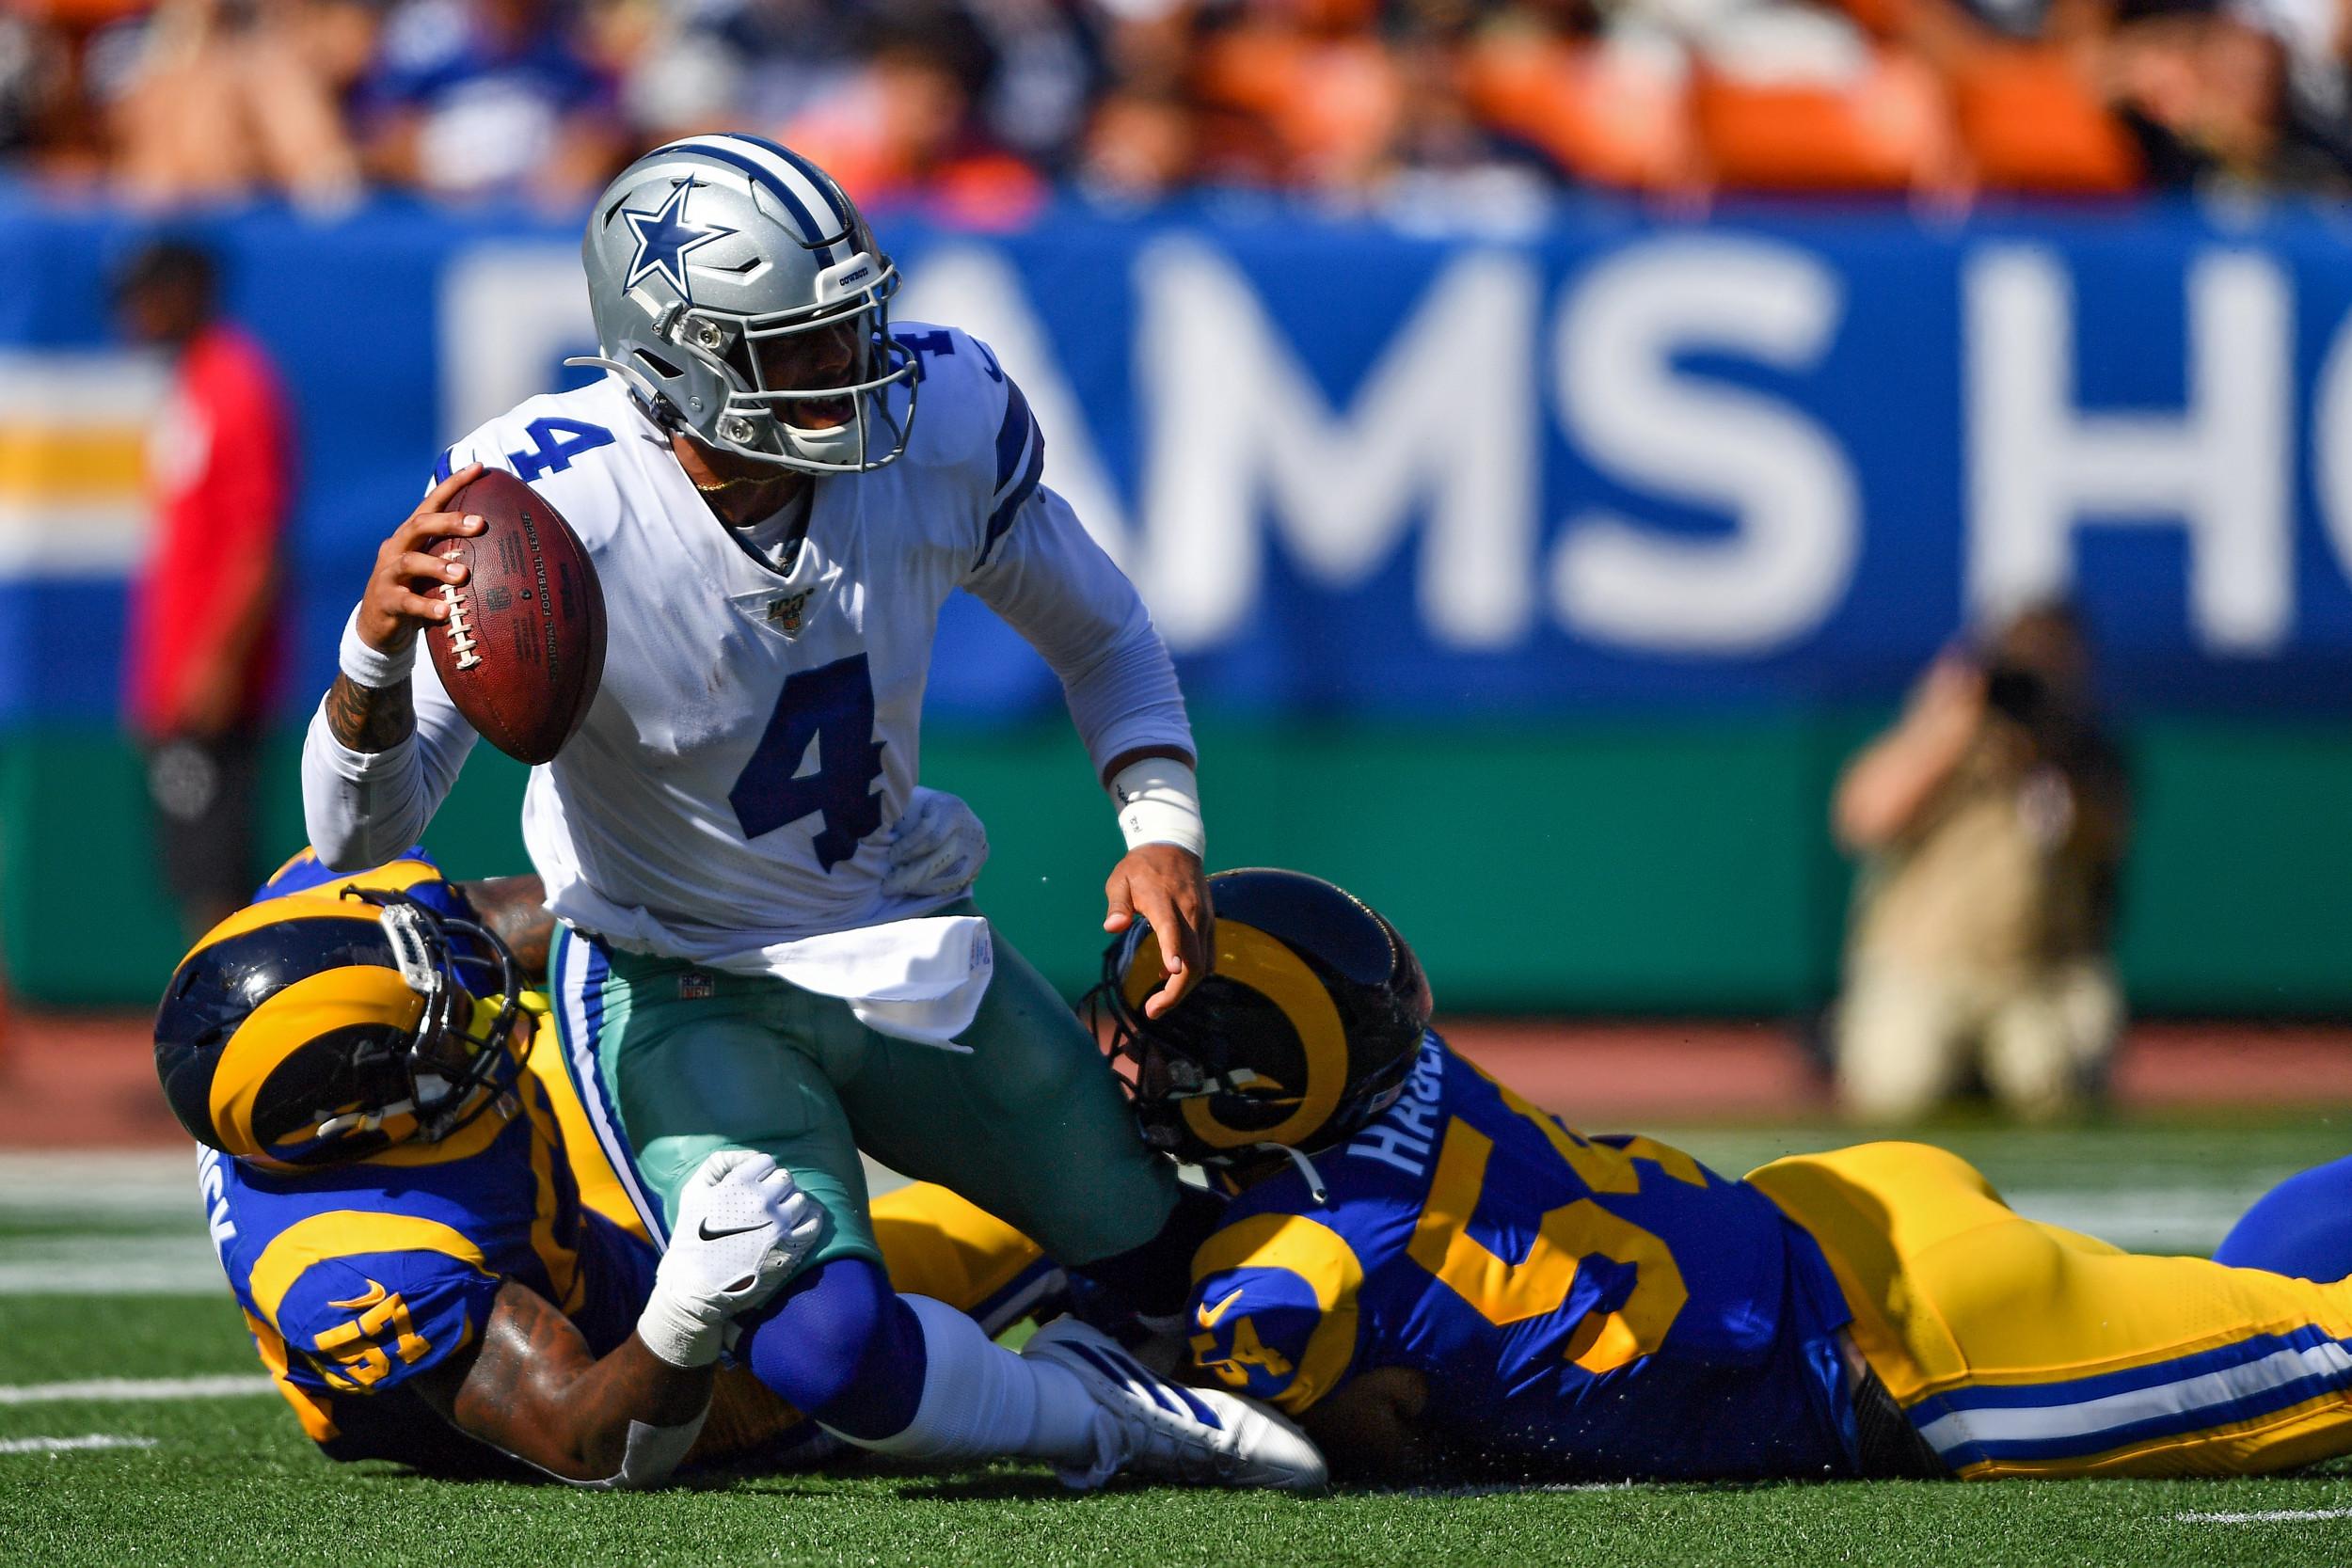 65109b3a NFL Preseason: Where to Watch Houston Texans vs. Dallas Cowboys, TV ...